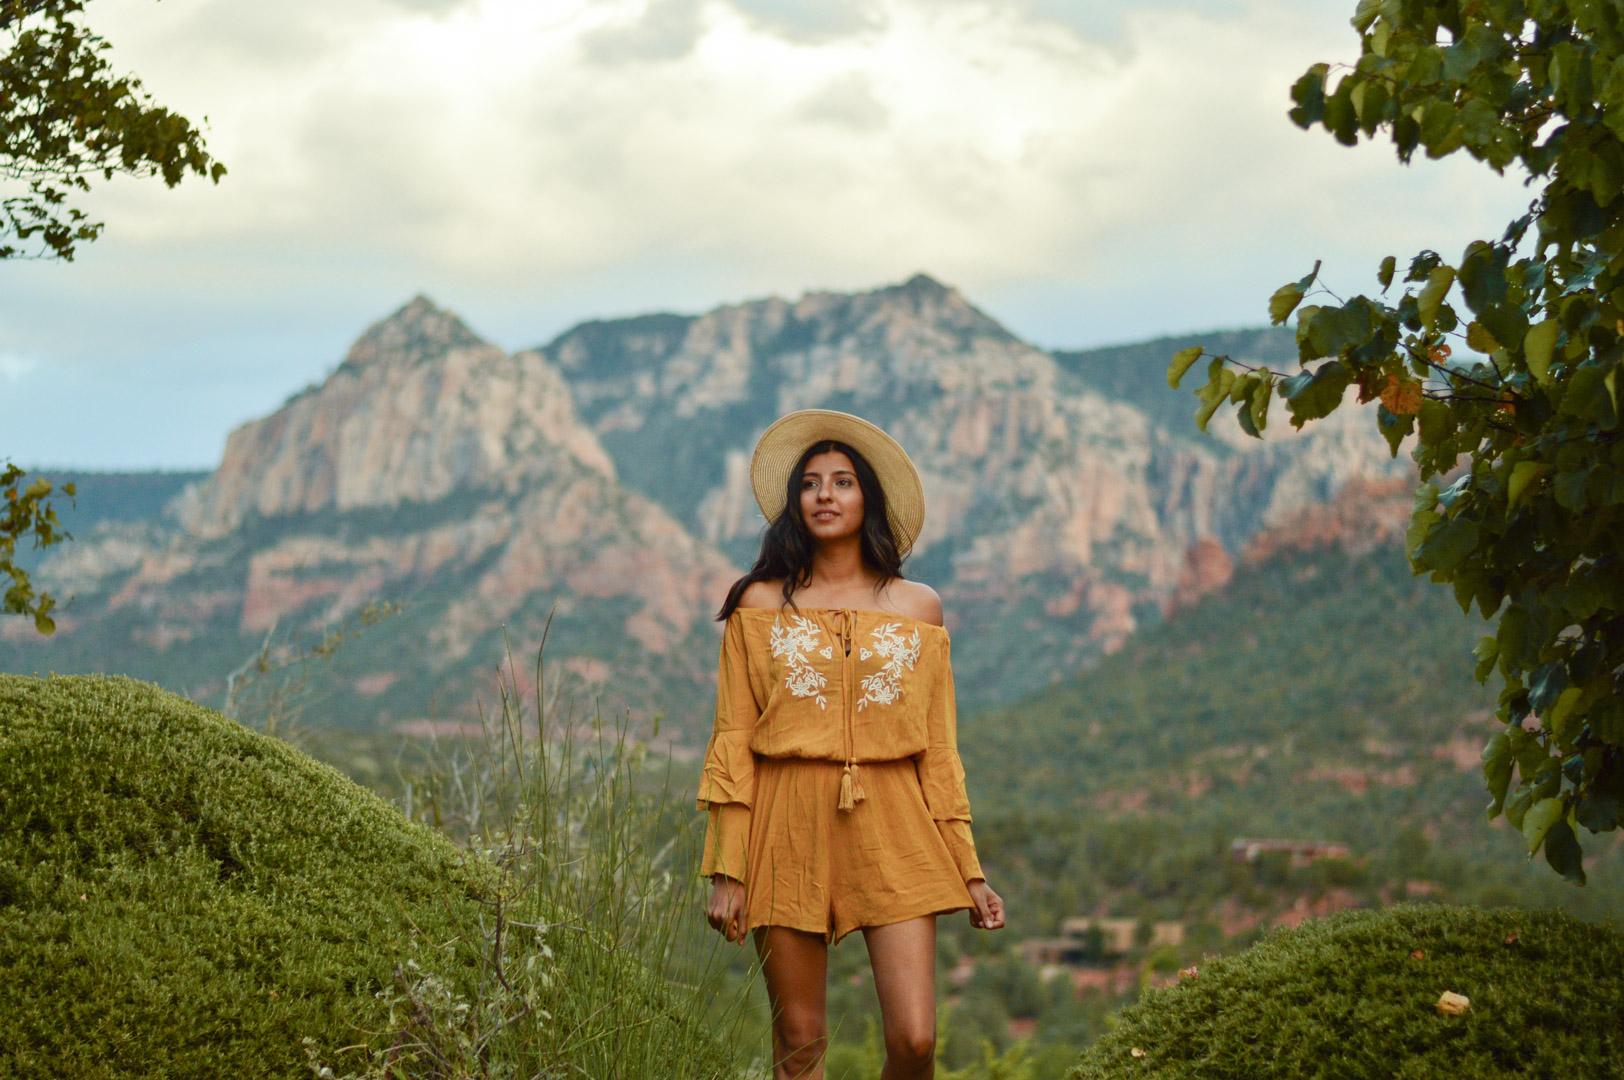 sedona-arizona-mustard-yellow-marigold-romper-travel-blogger-outfit 2